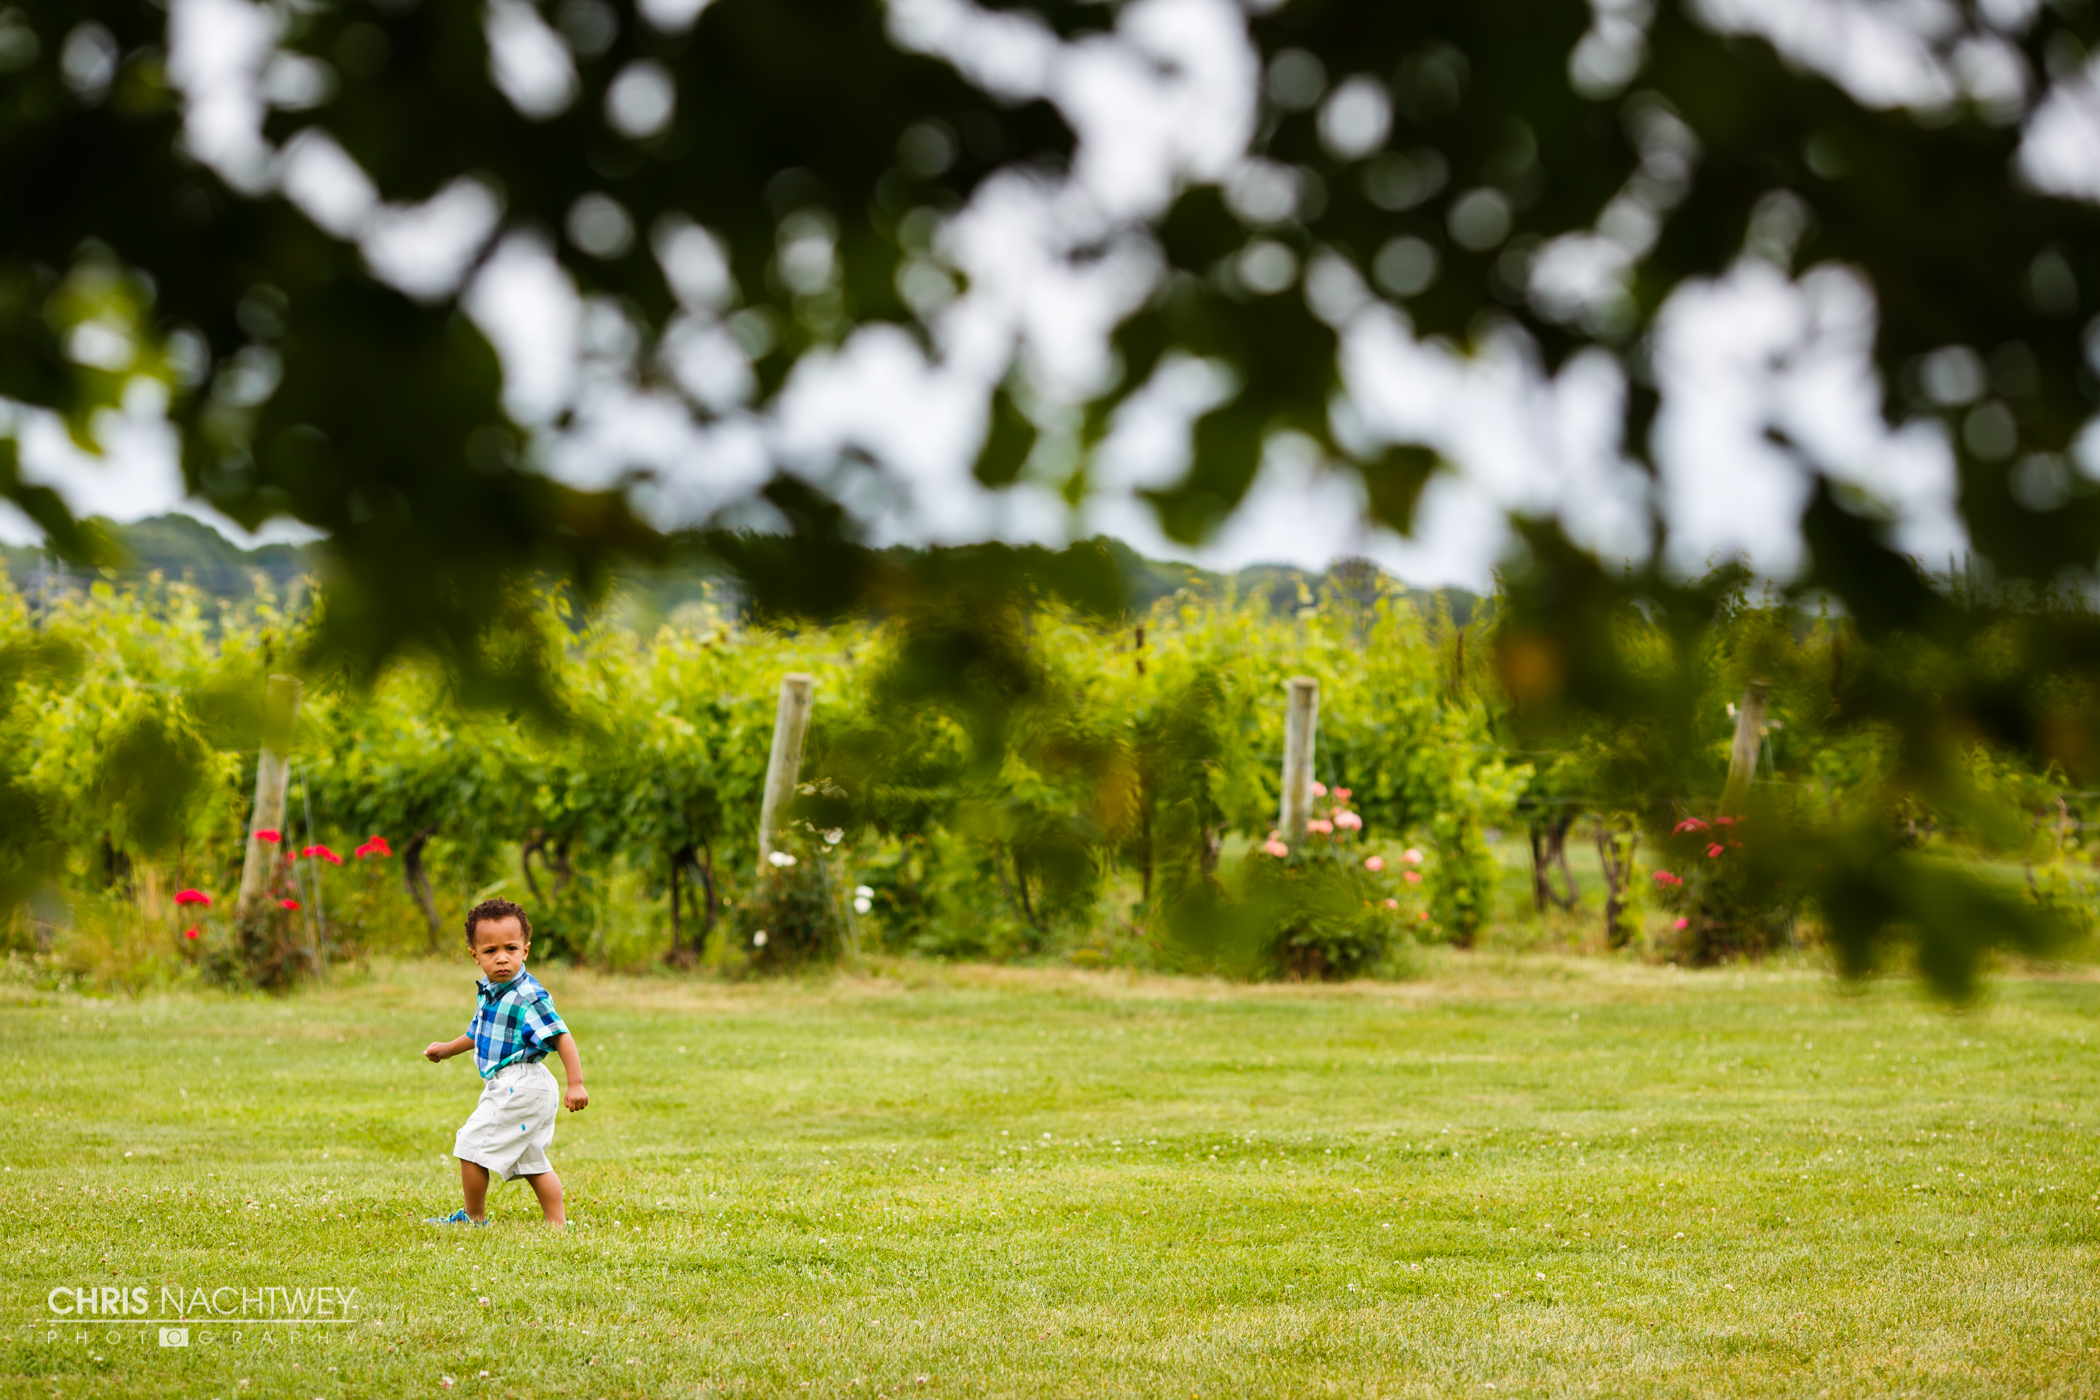 wedding-saltwater-farm-vineyard-photos-stonington-ct-chris-nachtwey-photography-2016-ana-austin-28.jpg